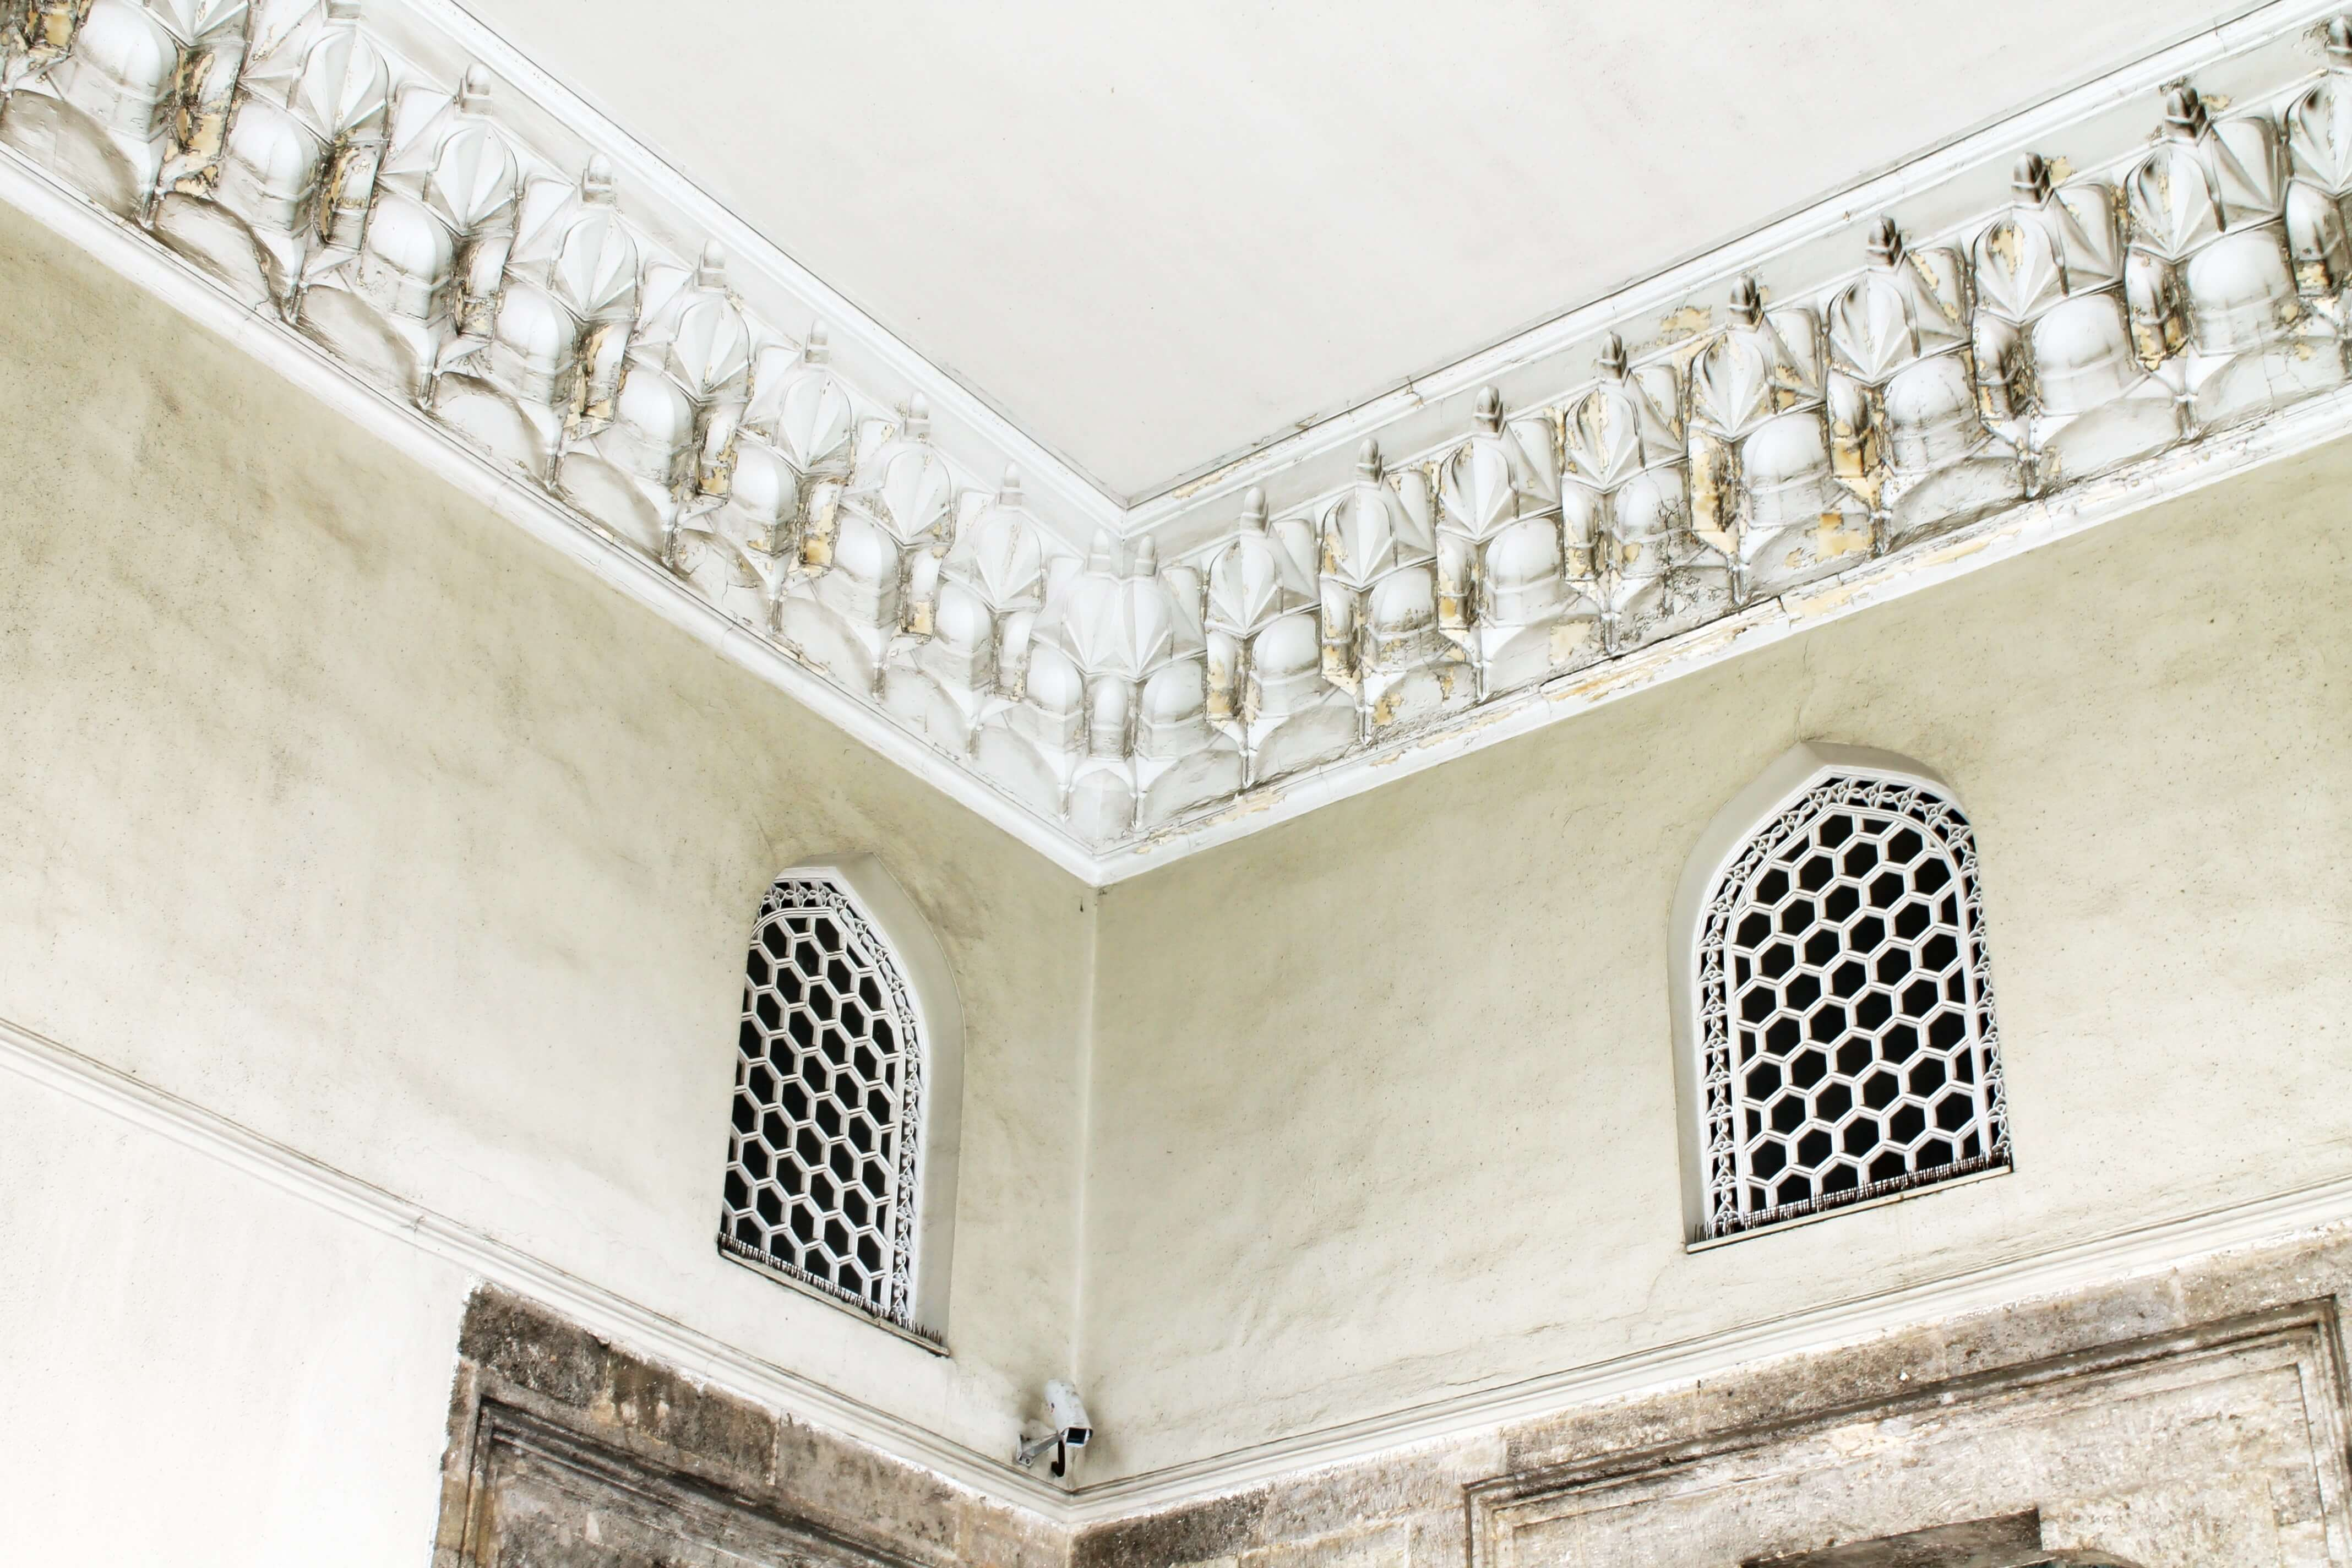 Circumcision Chamber_exterior_detail_Topkapi 4th Courtyard